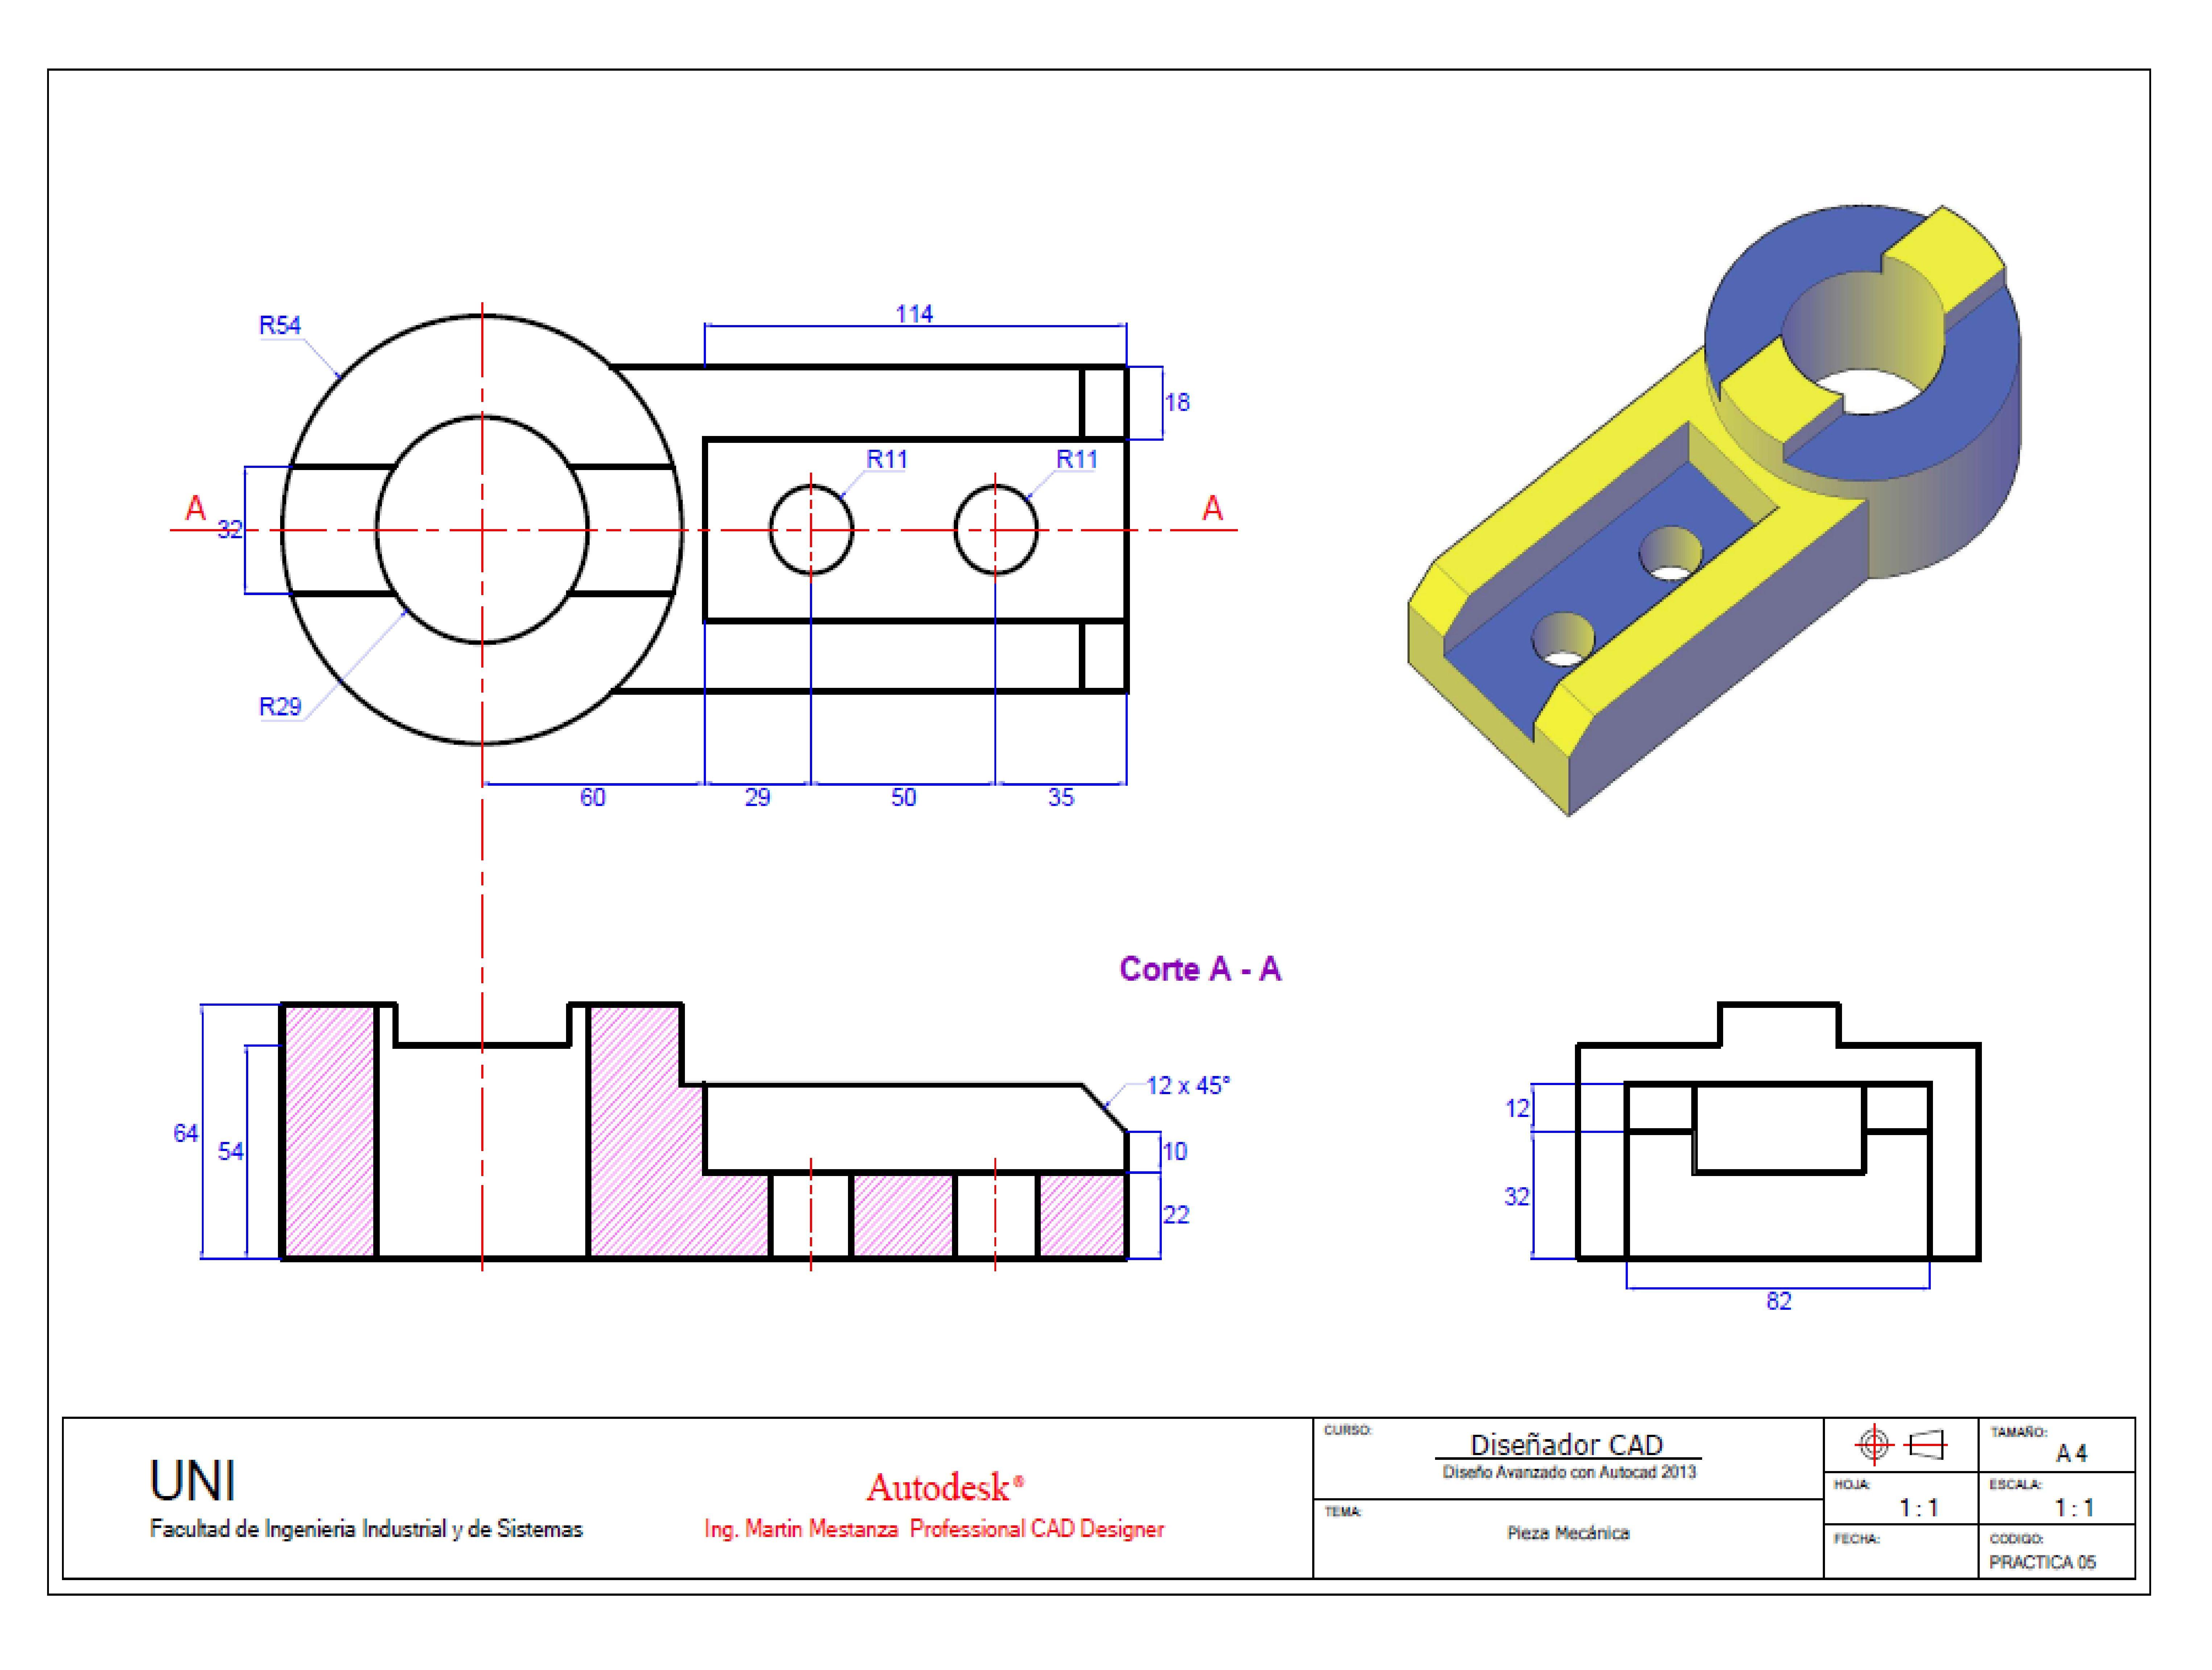 Practica De Clase Autocad 3d N 5 Para El 15 De Diciembre Solidworks Tutorial Autocad Technical Drawing